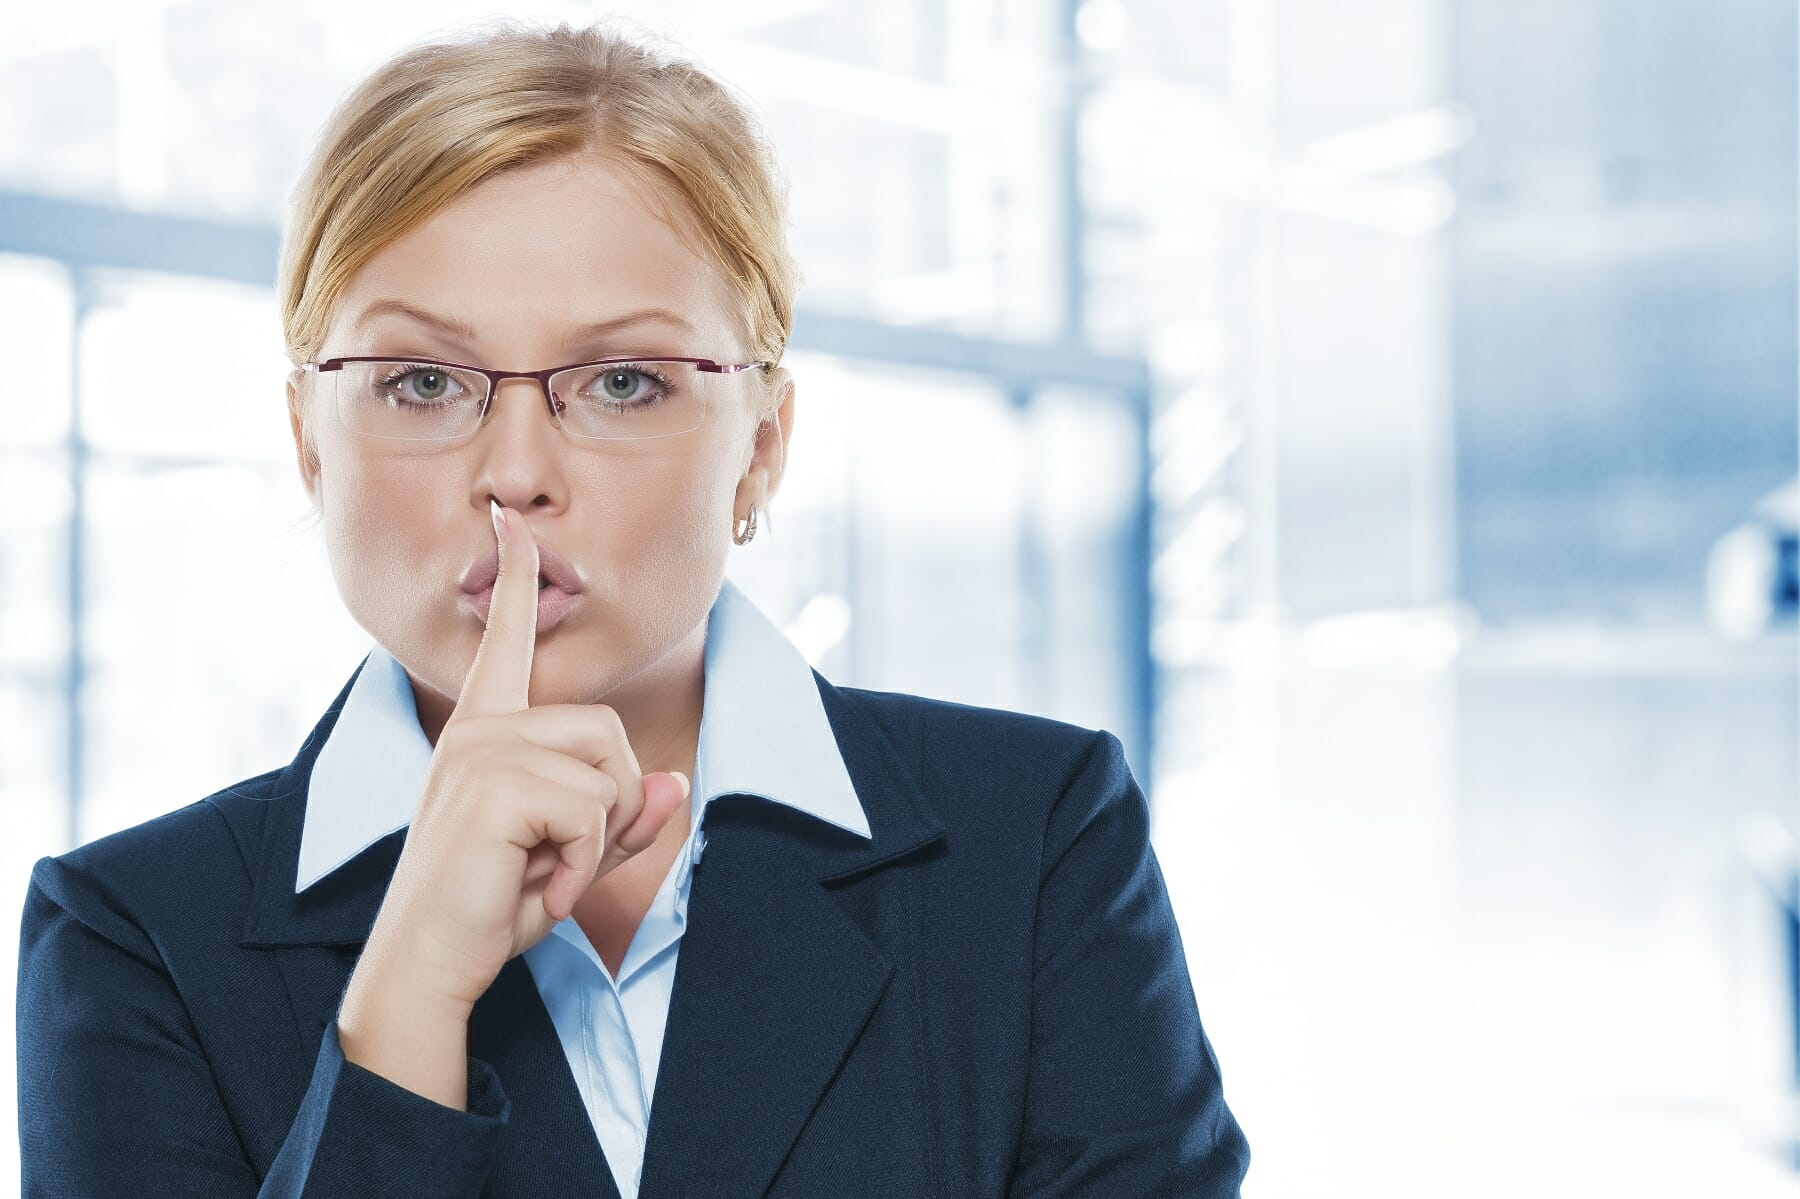 side conversations during meetings